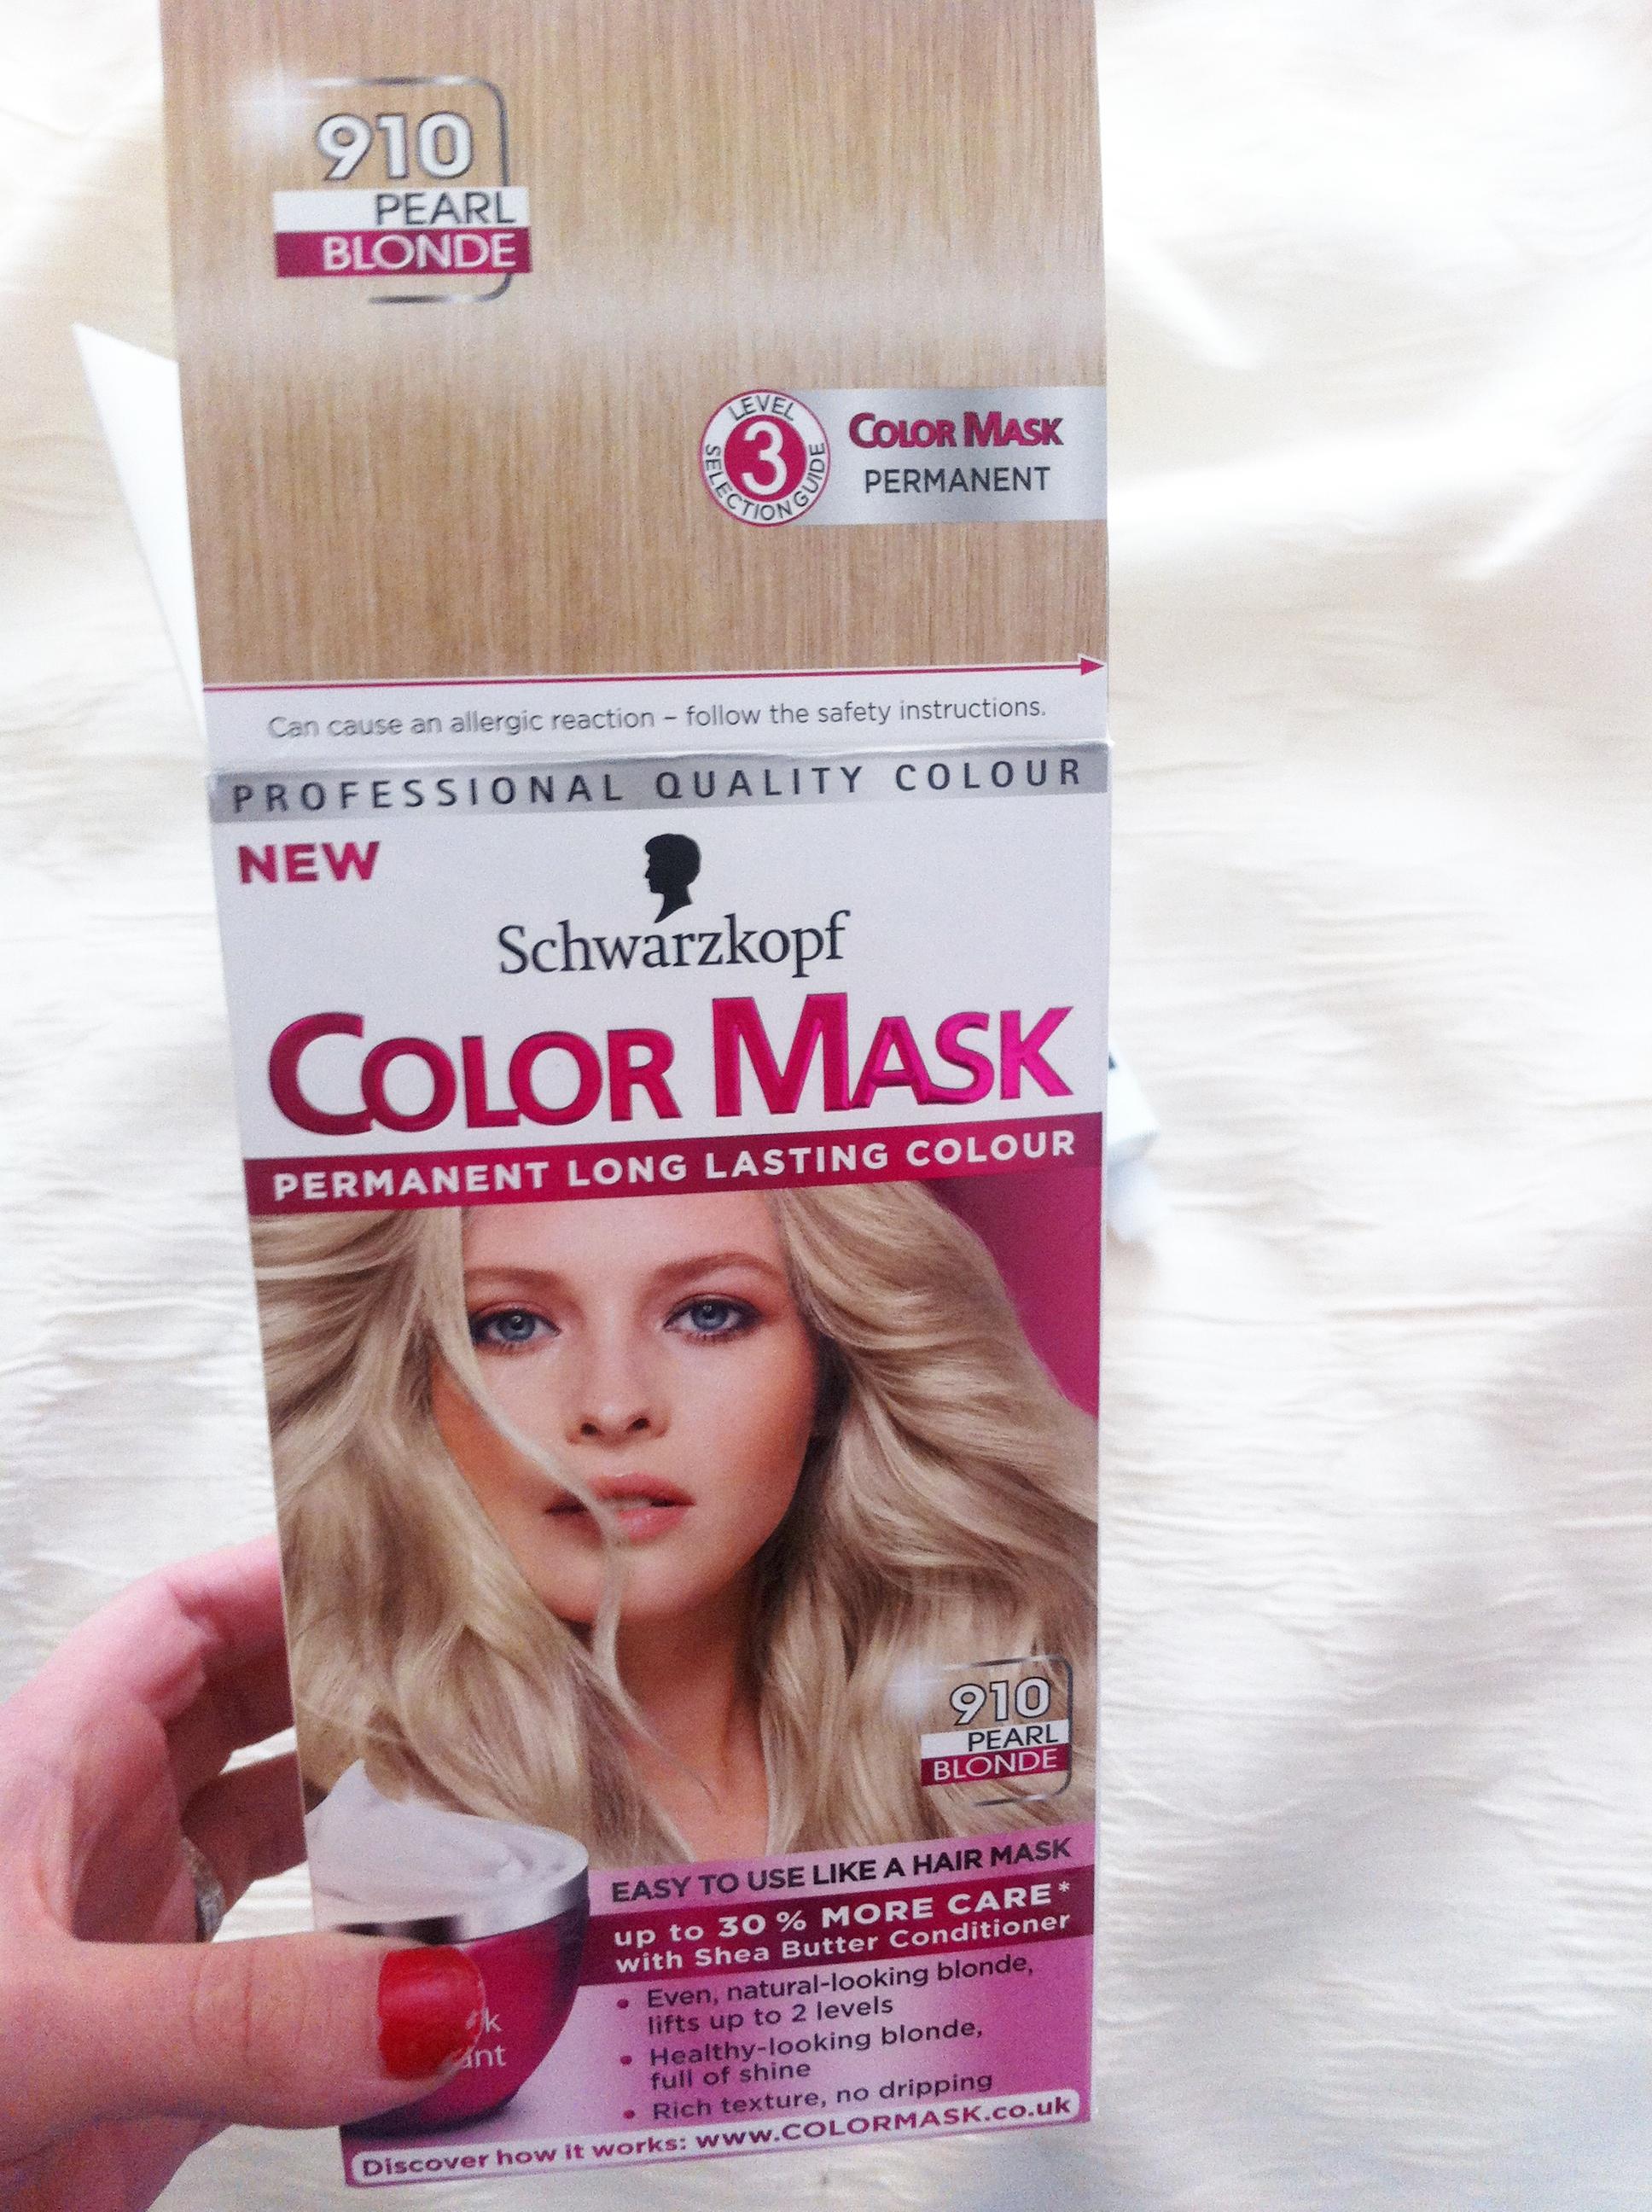 Schwarzkopf Pearl Blonde Color Mask 910 Review